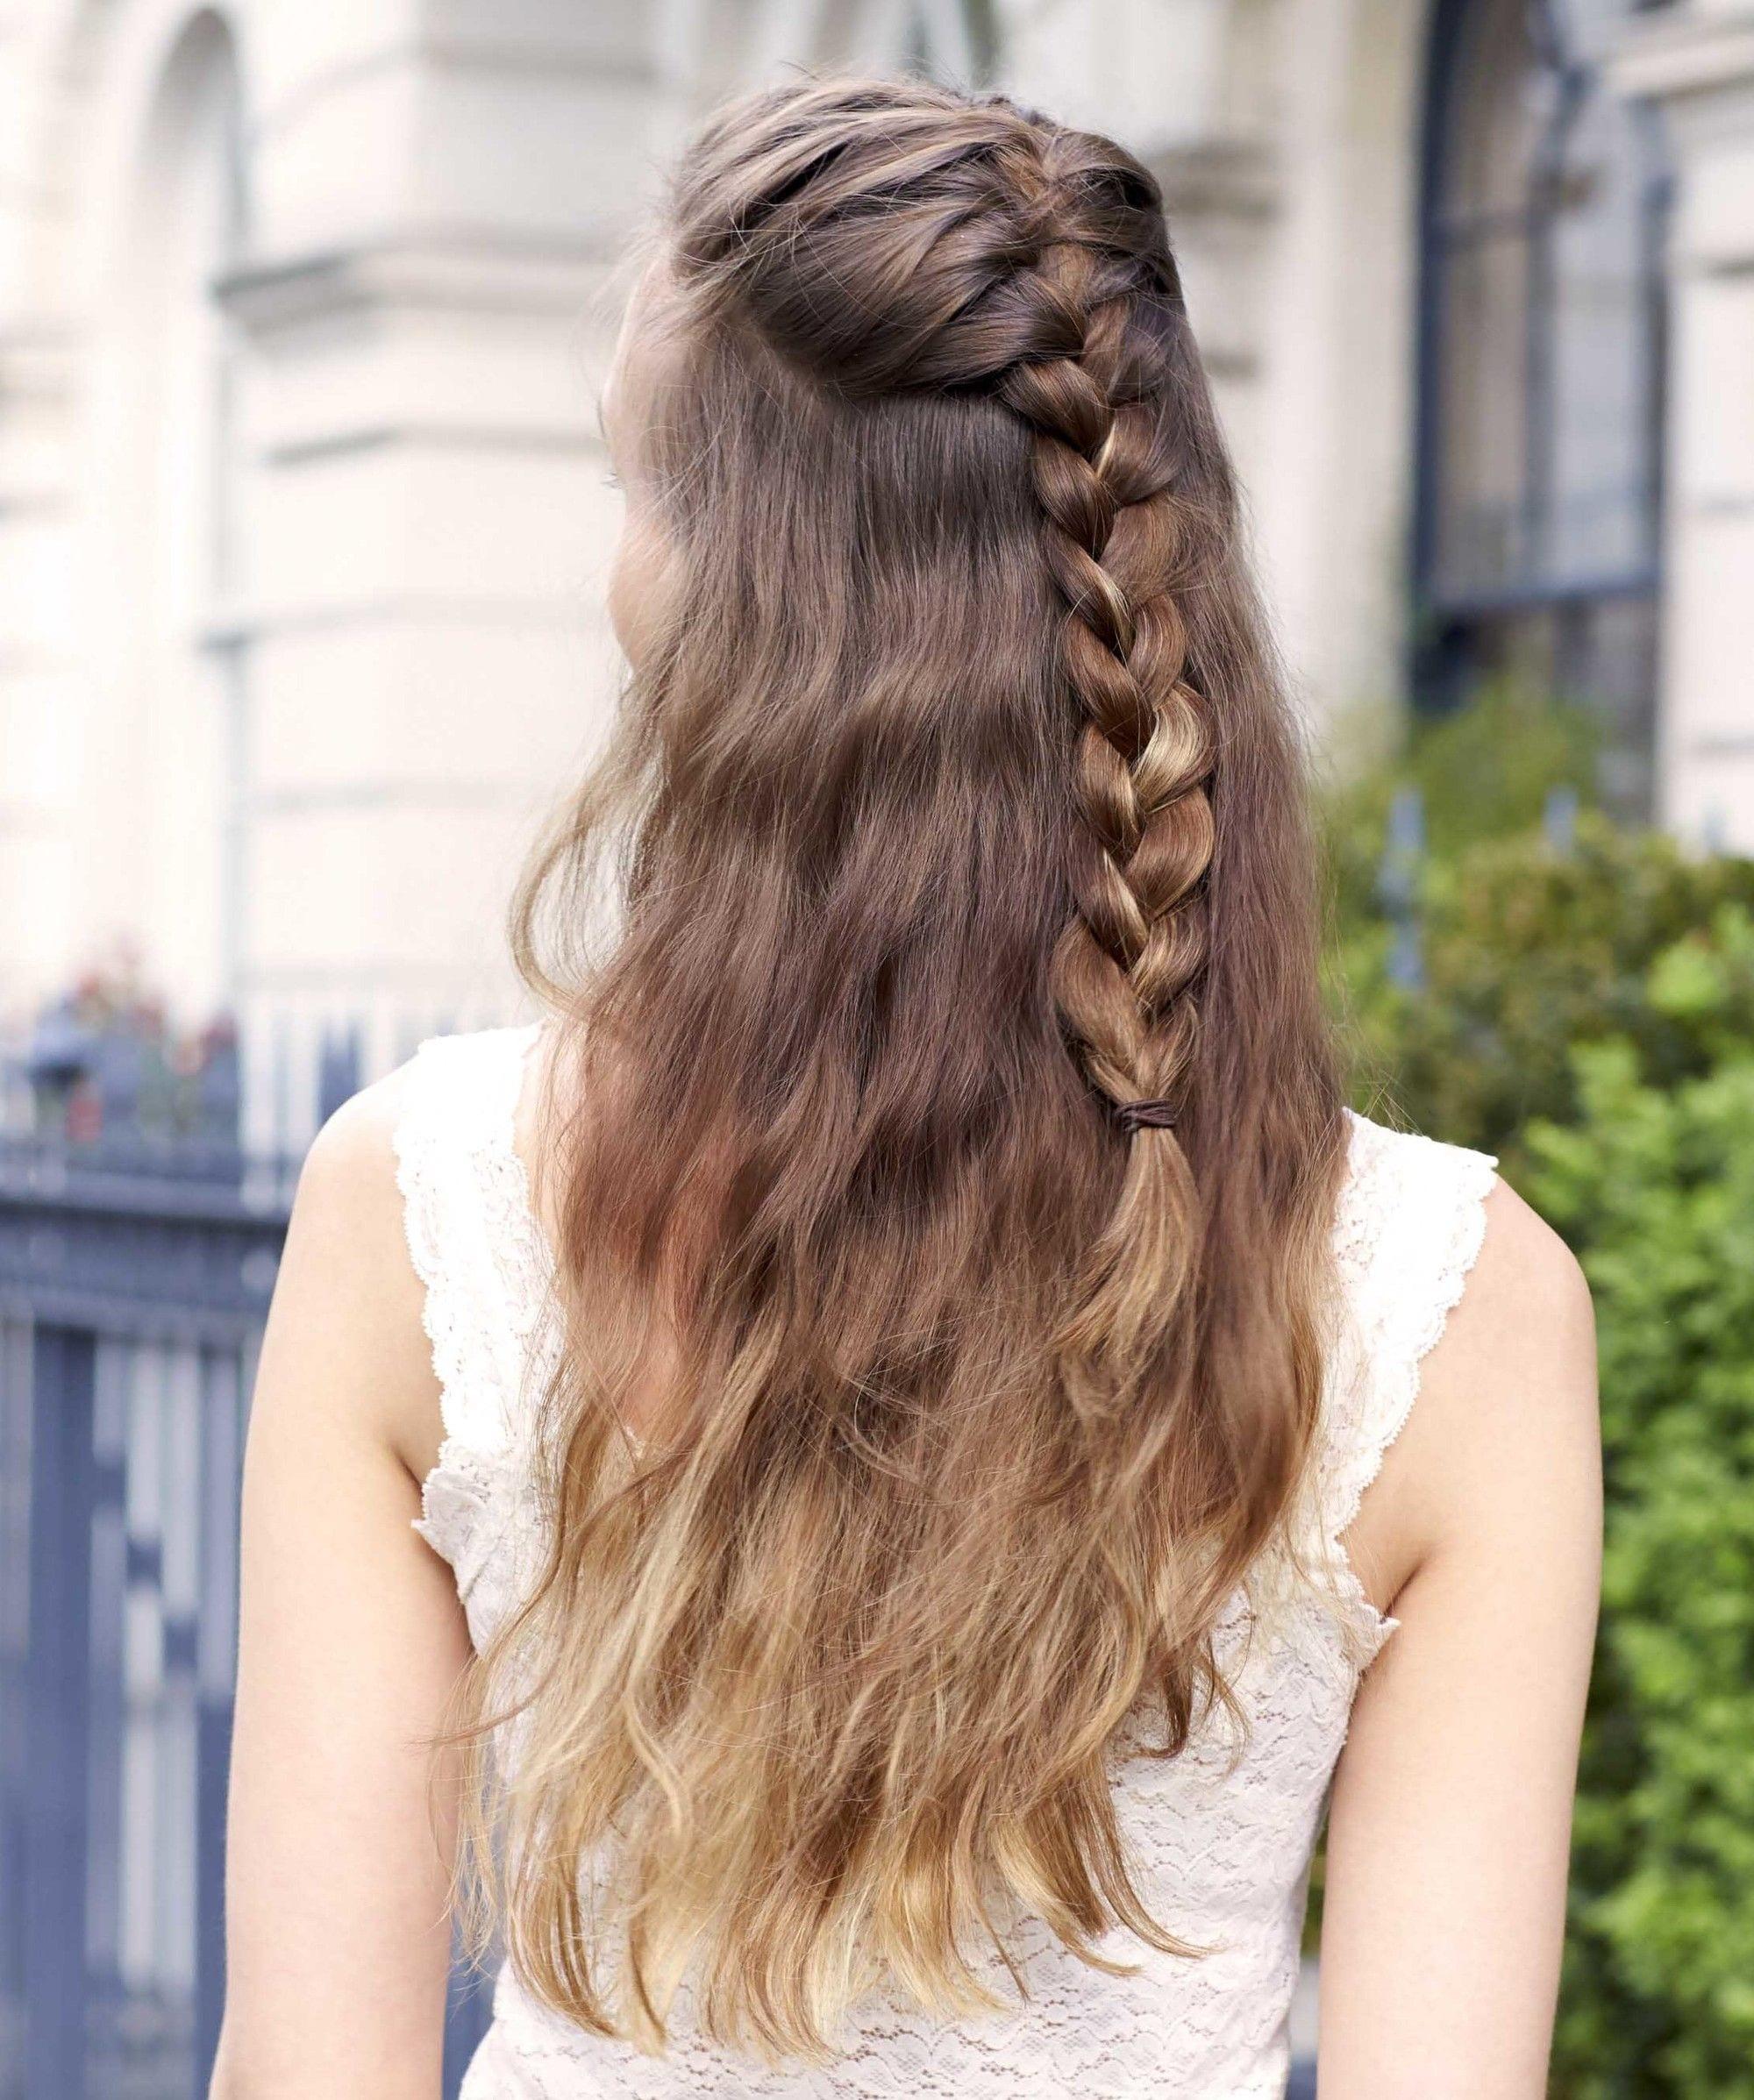 classic braid hairstyles: half-up braid